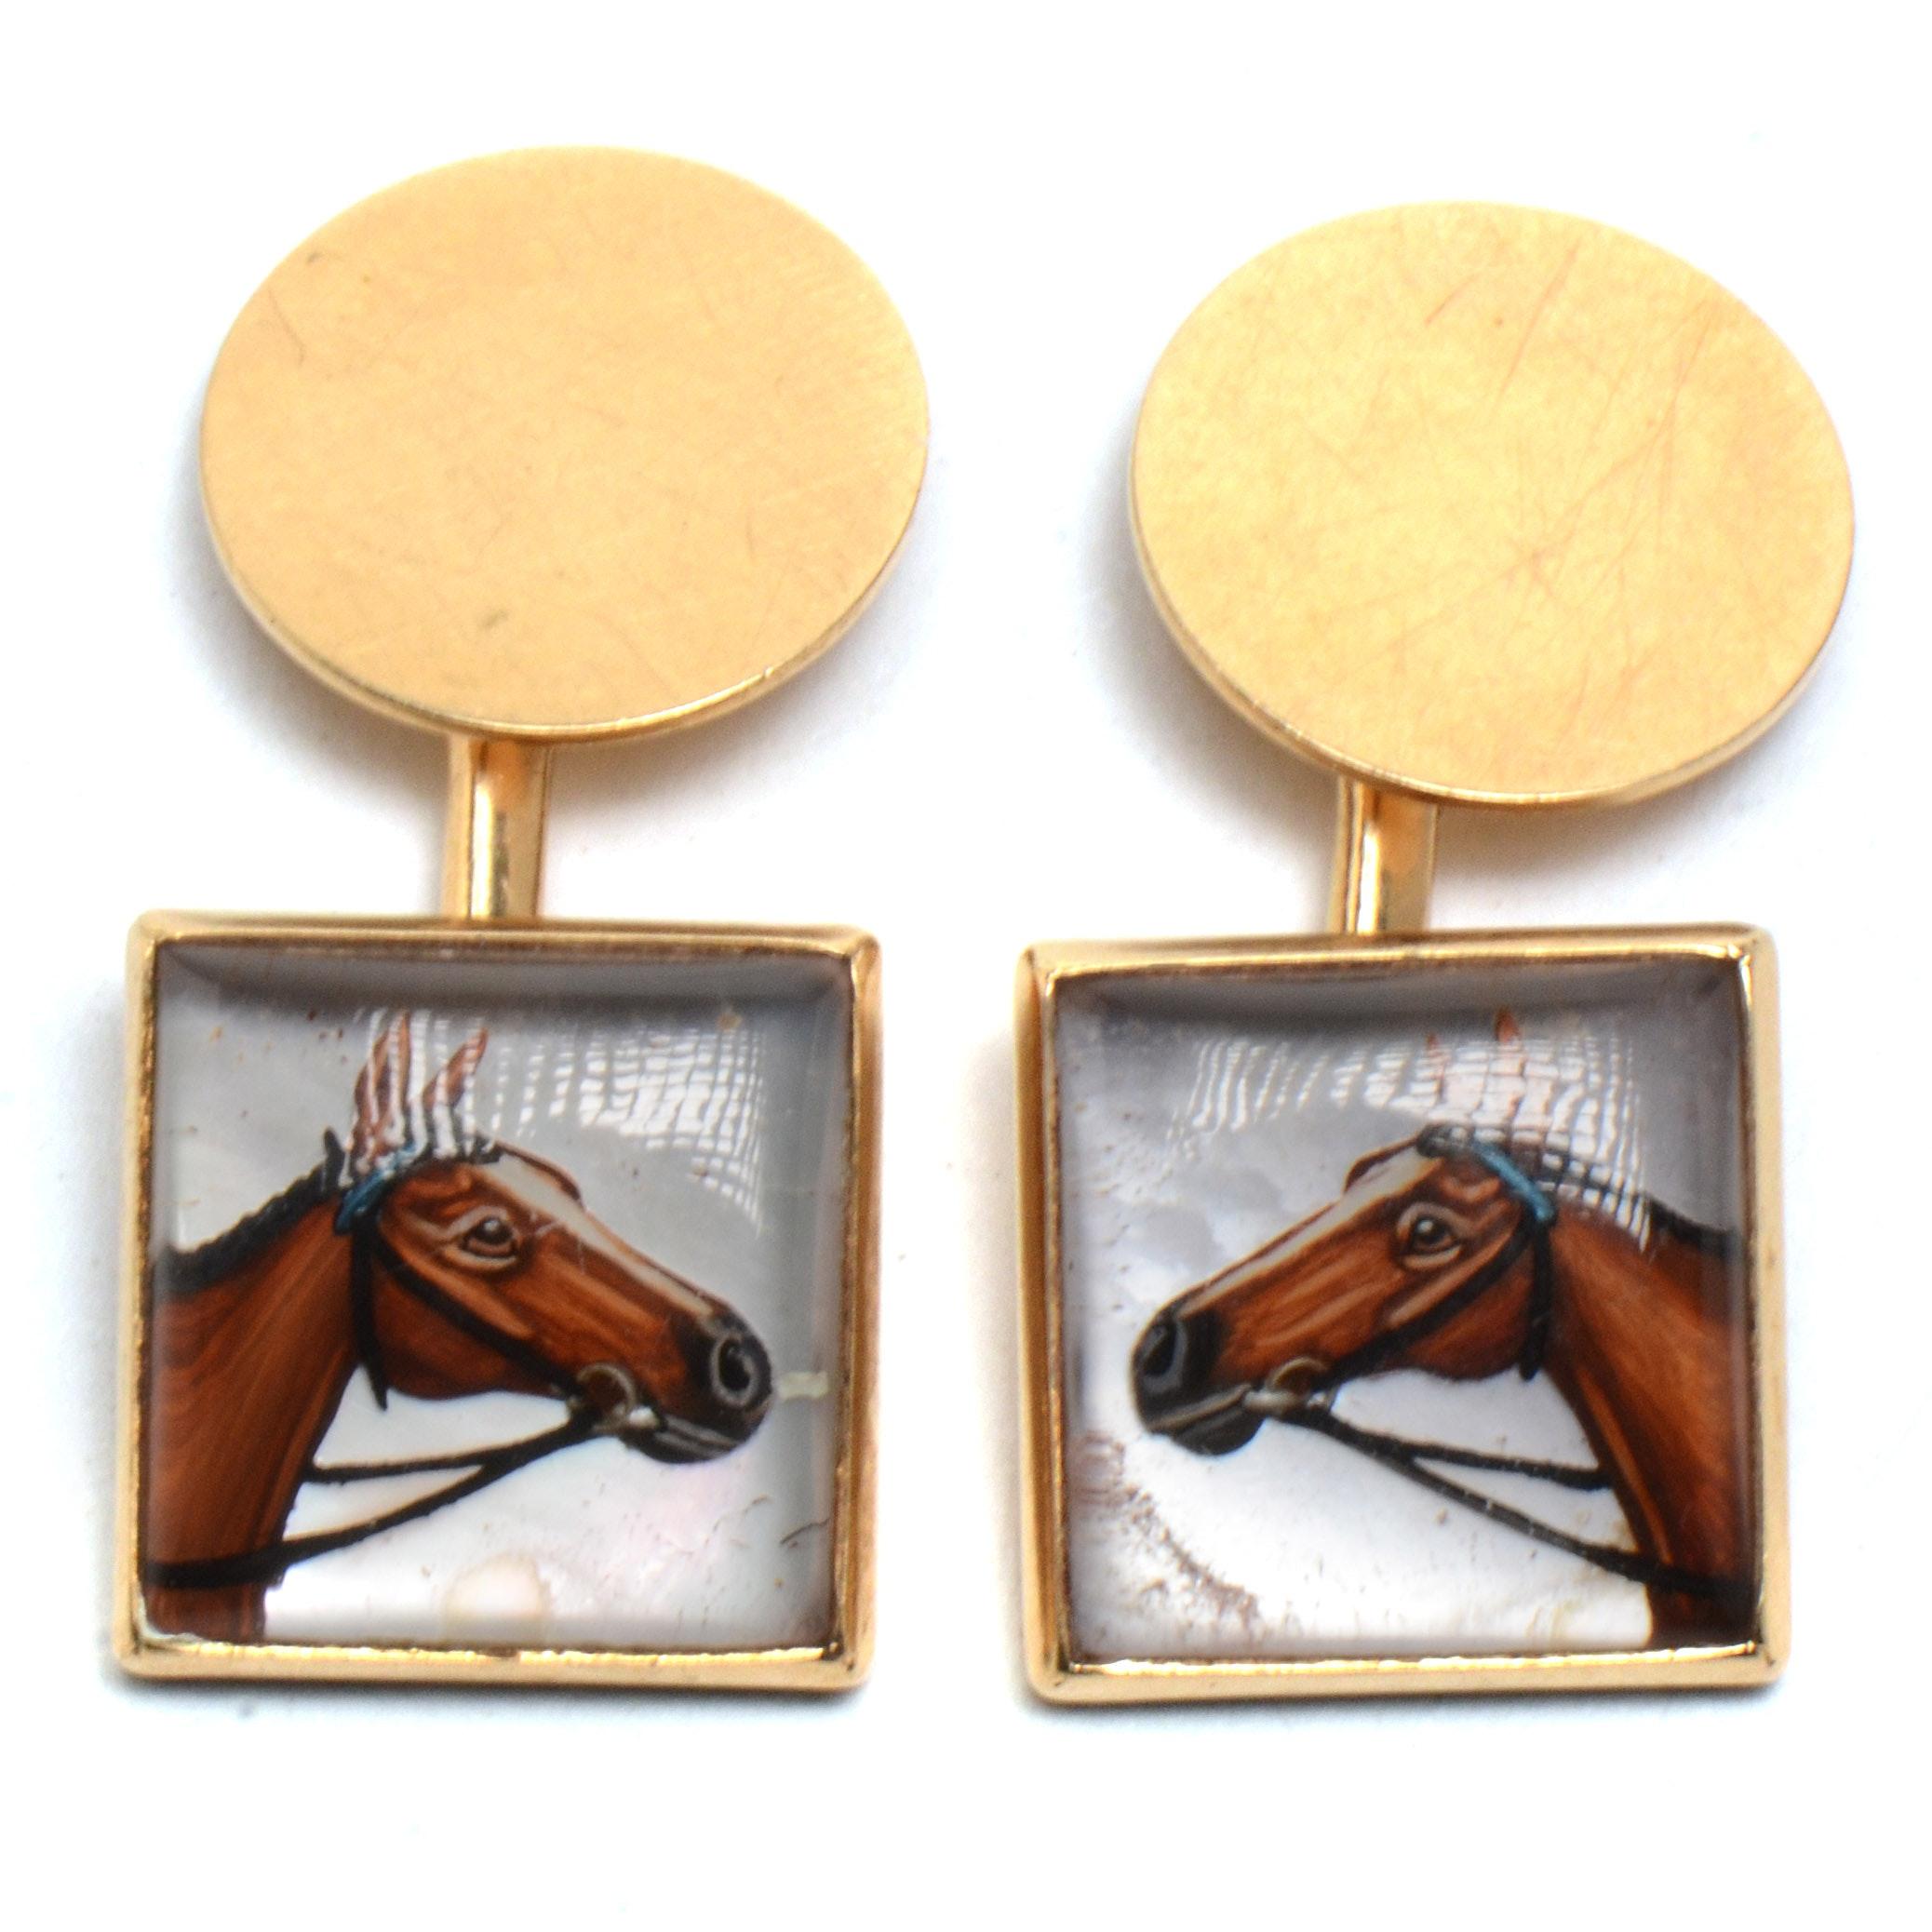 Men's Vintage 14K Yellow Gold Hand Decorated Equestrian Cufflinks